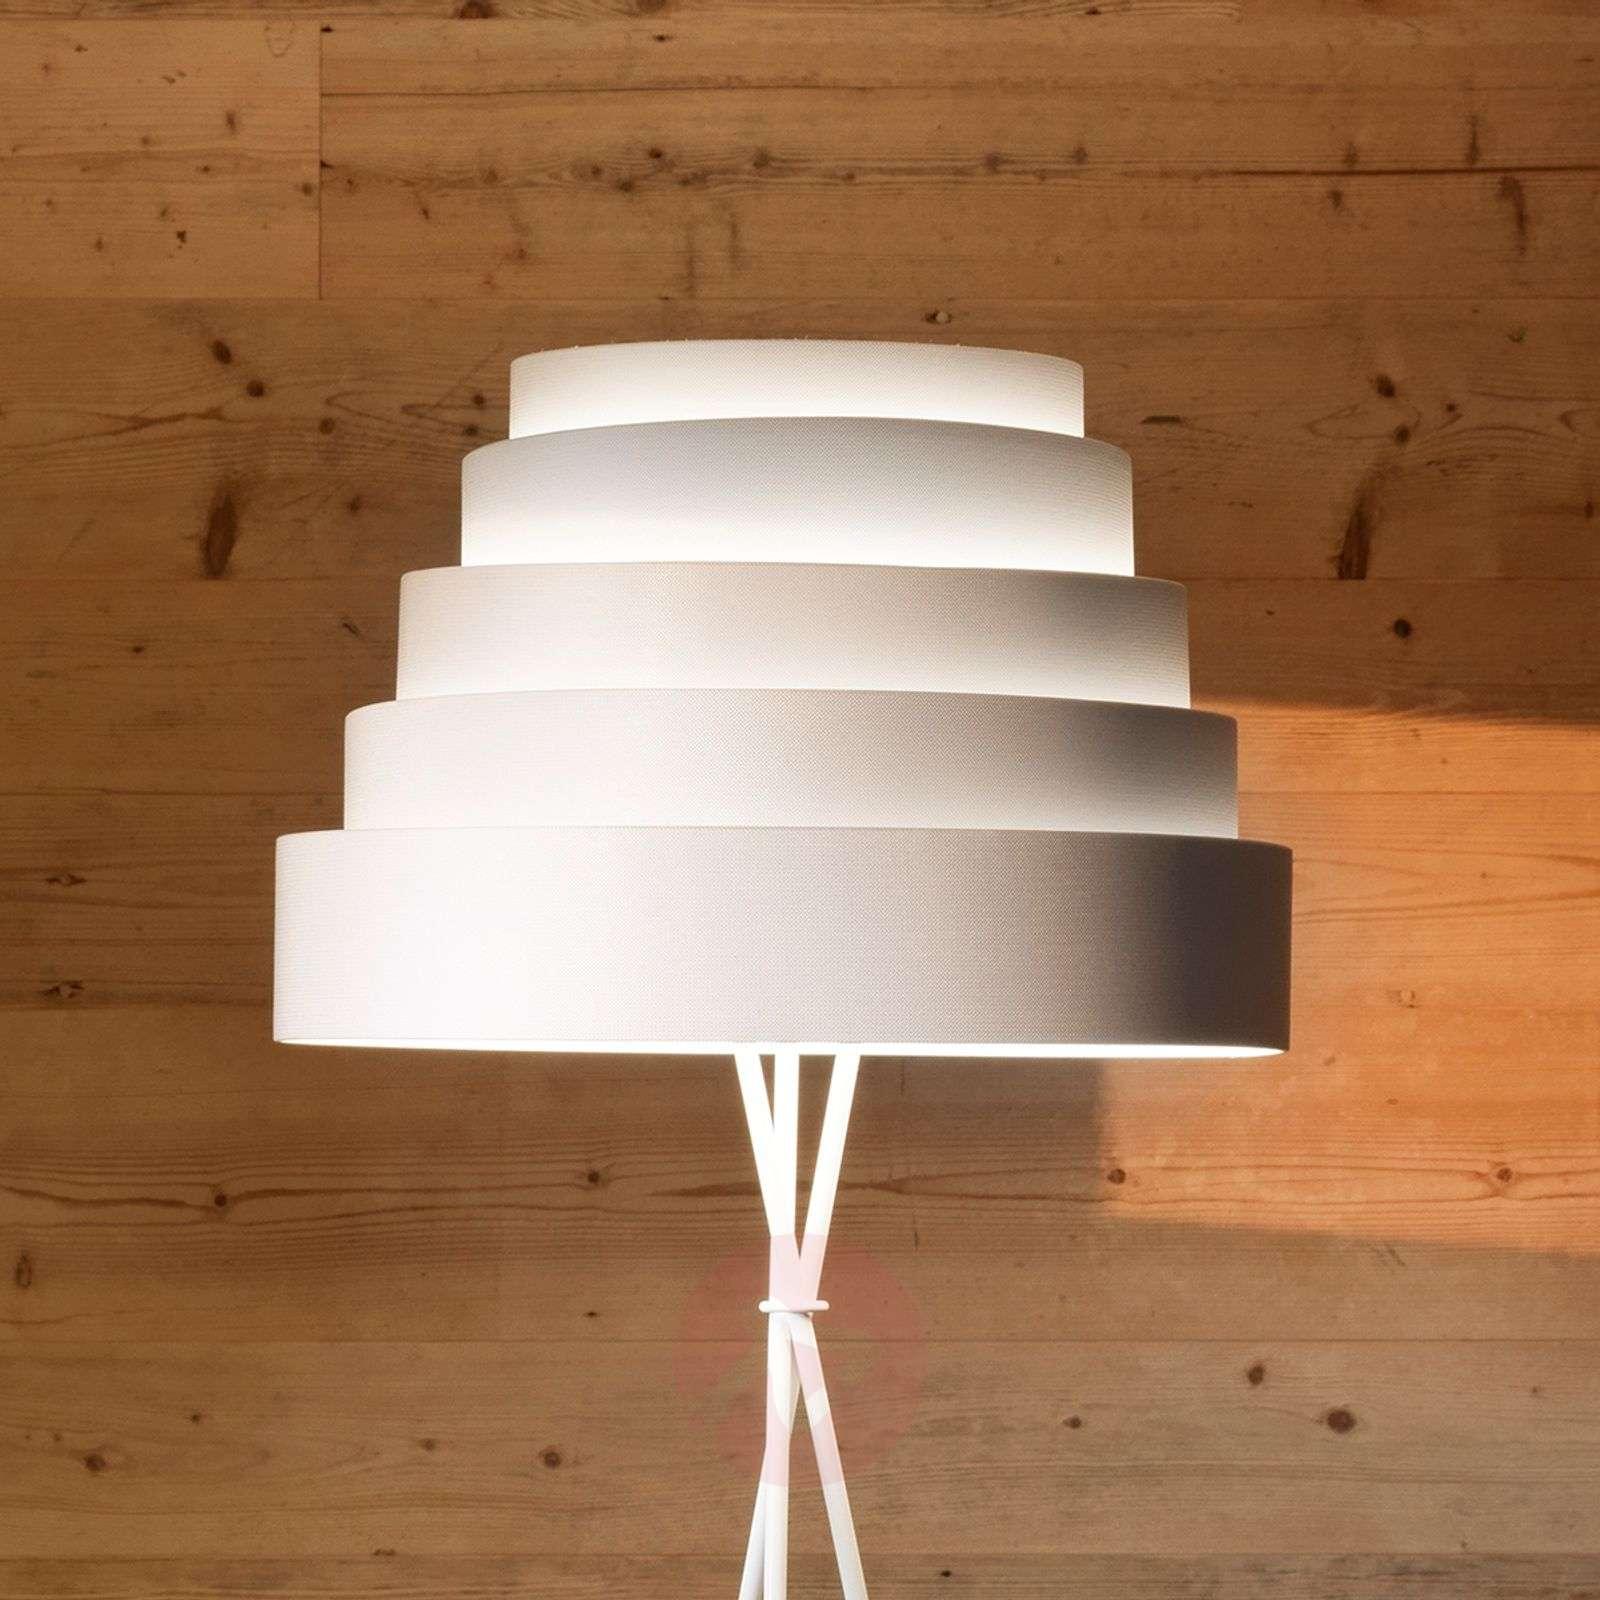 Babel beautiful floor lamp on a tripod-5501085X-01